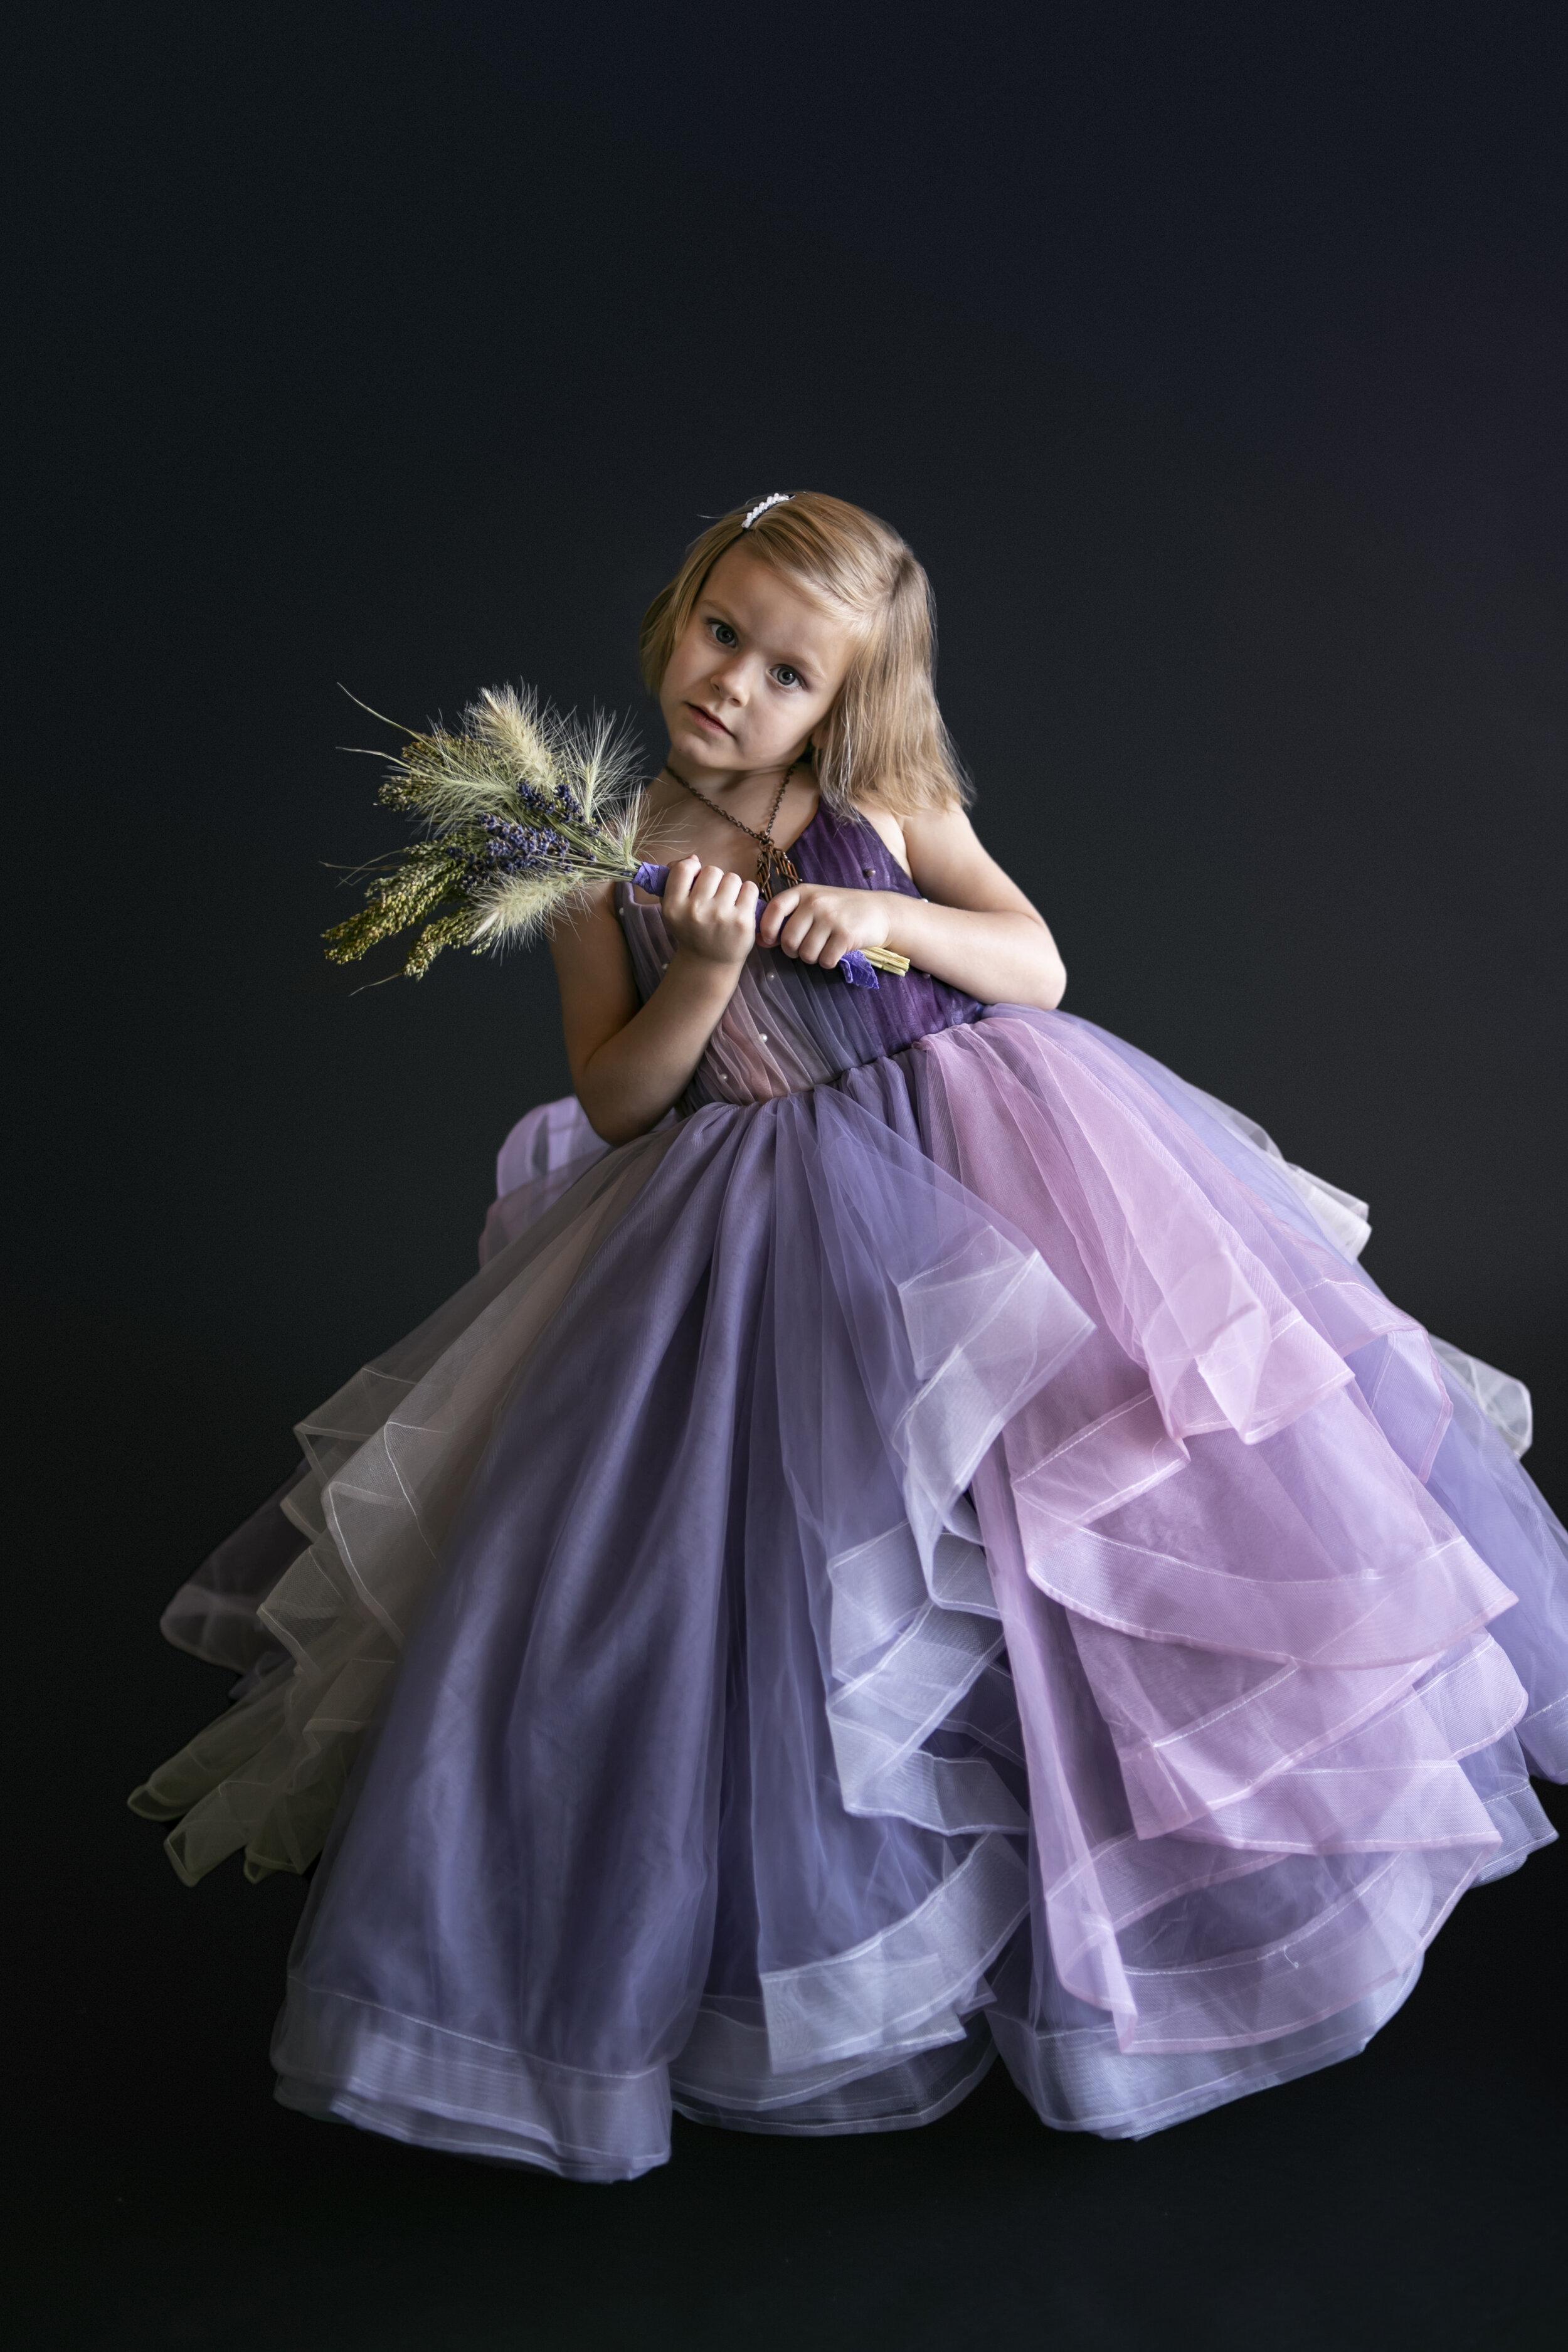 chicago illinois lake county illinois couture child-9028.jpg